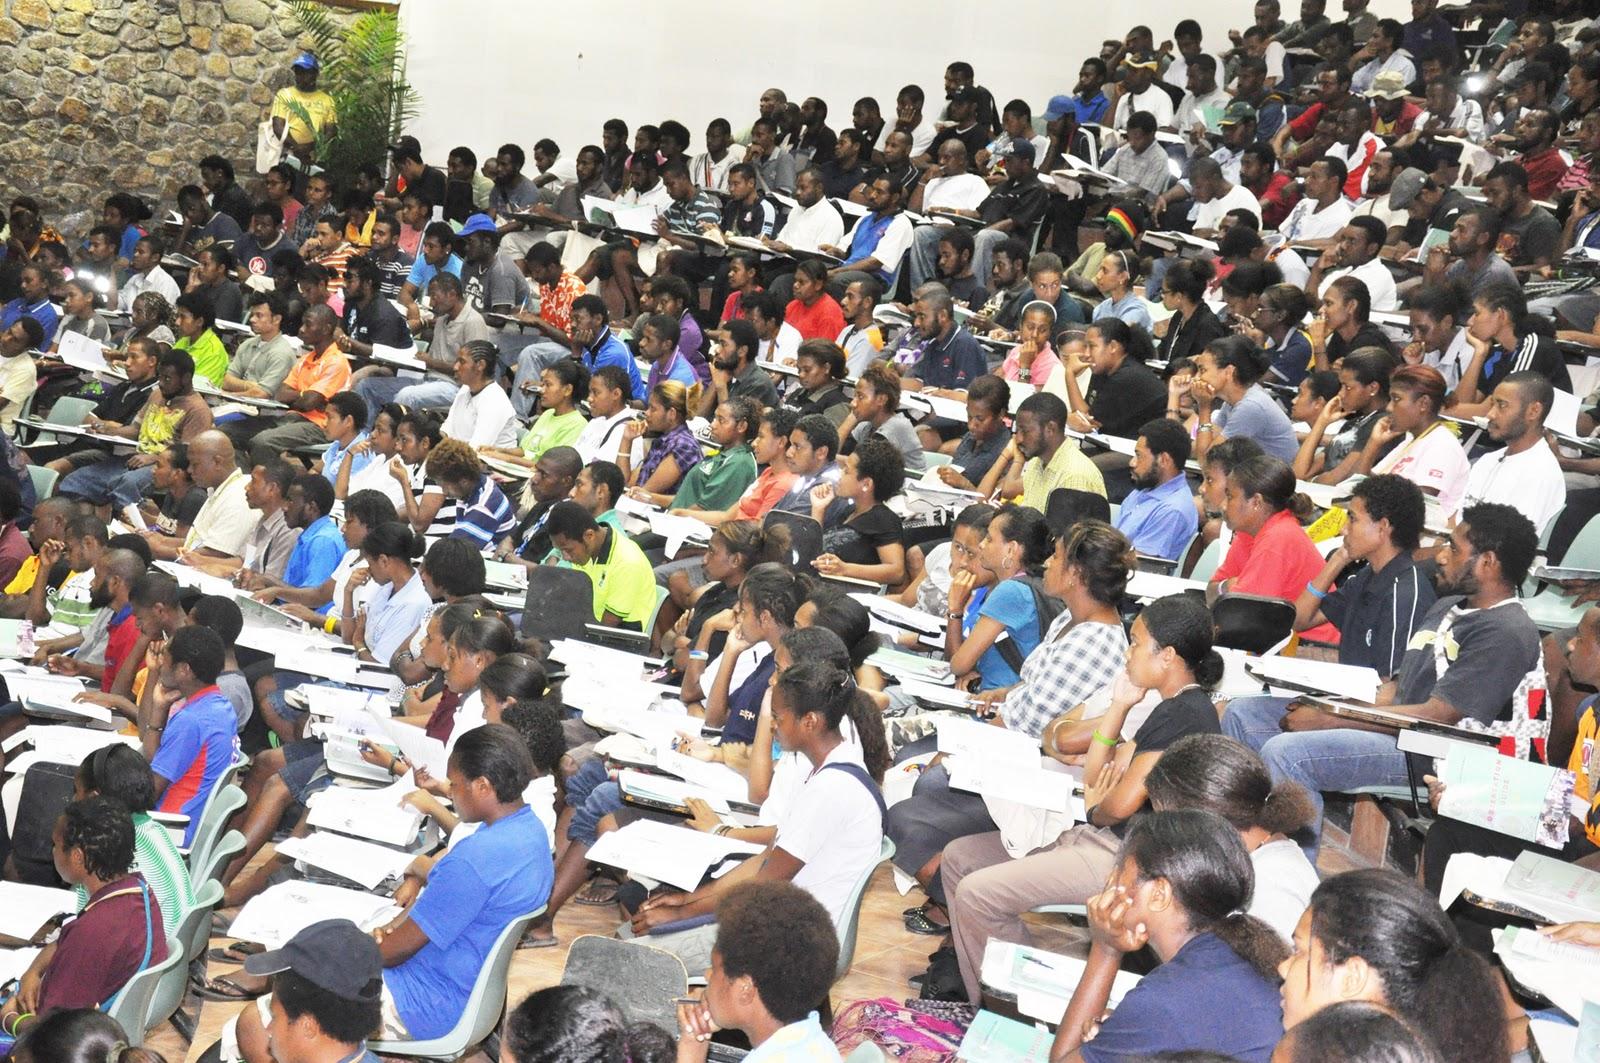 UPNG Suspends 2016 Academic Year EMTV Online